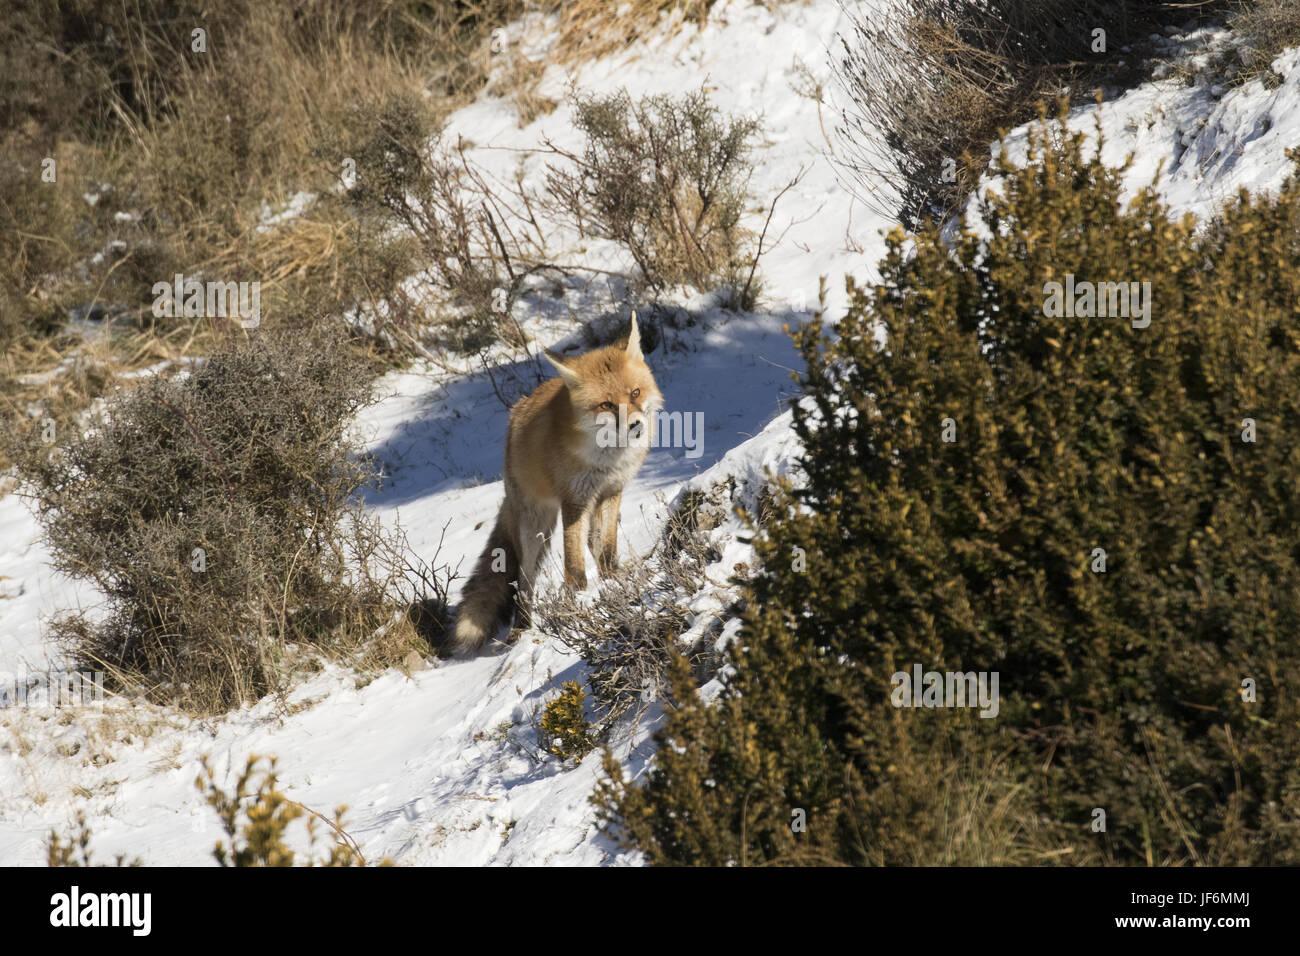 lurking fox - Stock Image